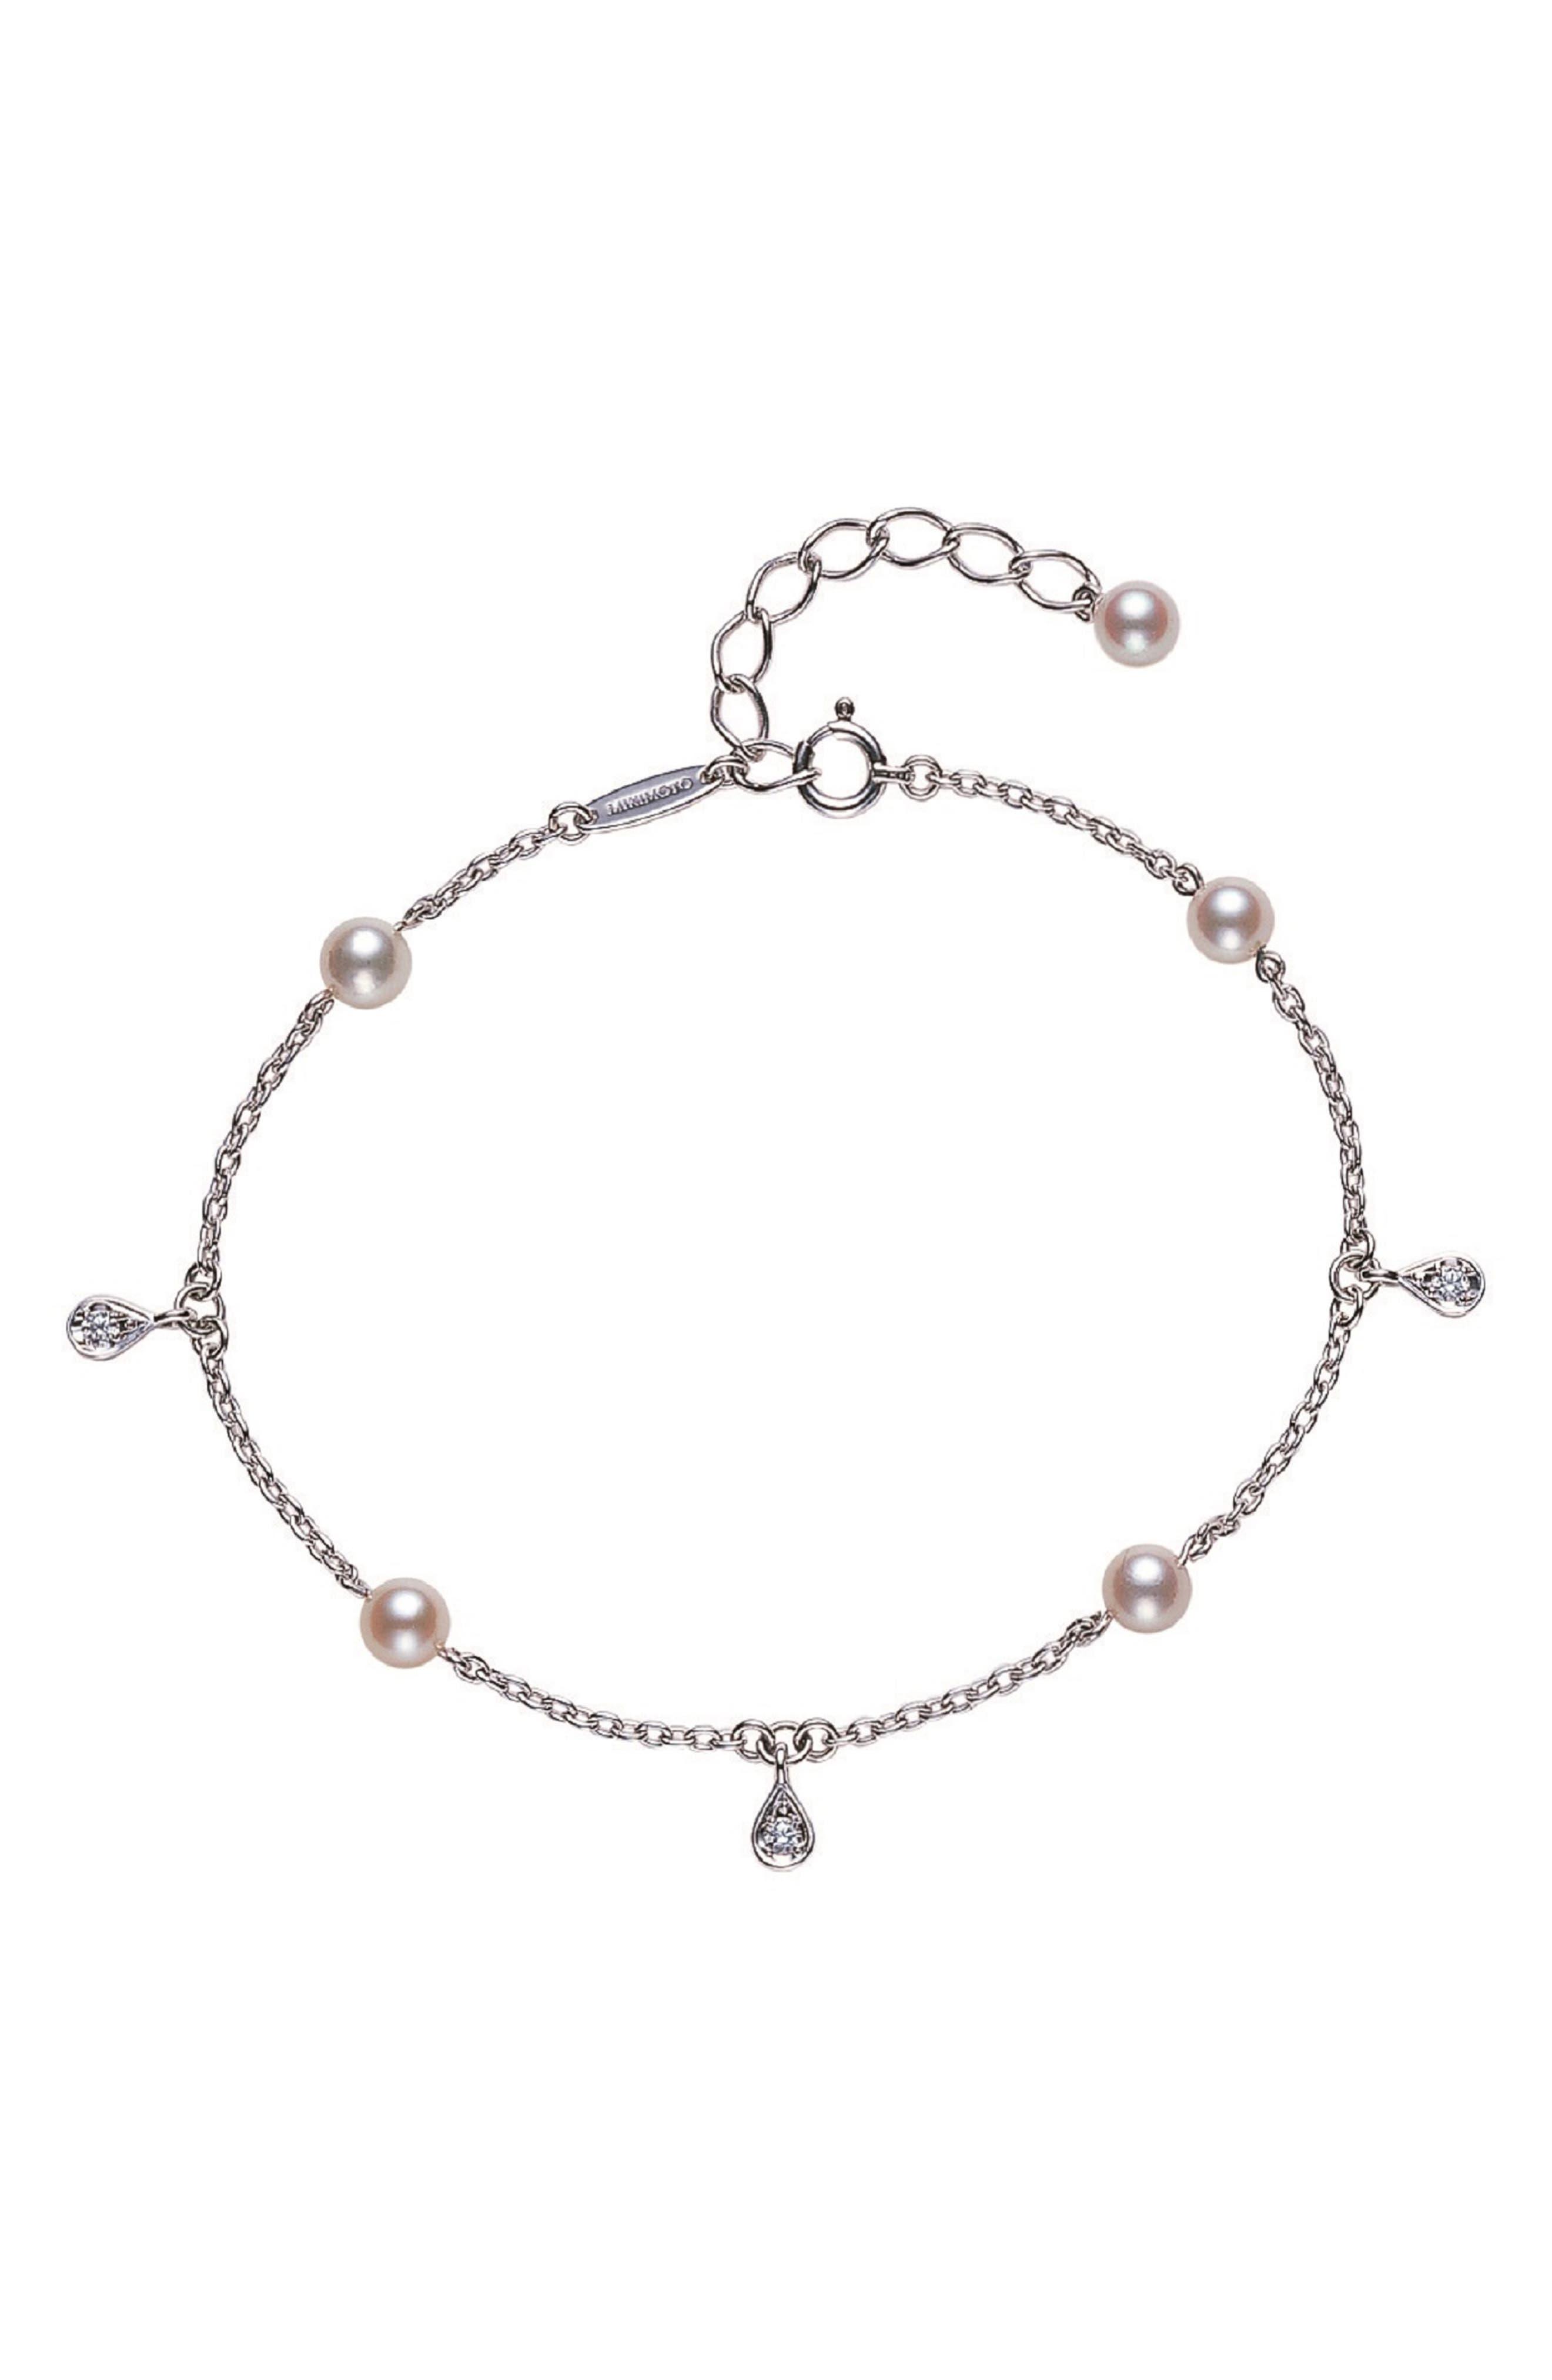 MIKIMOTO Pearl & Diamond Bracelet in White Gold/ Pearl